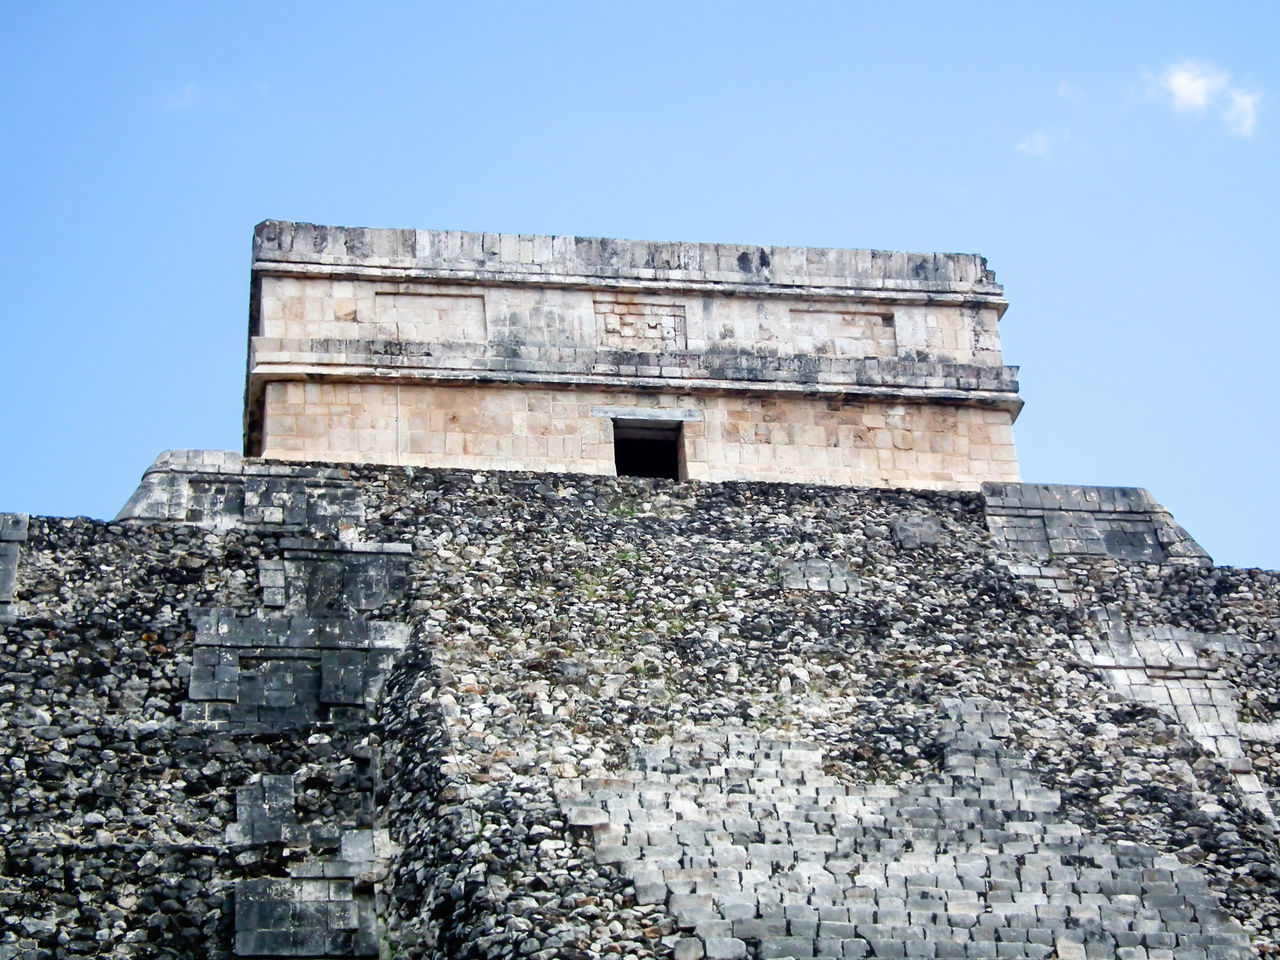 Archaeological Sites Architecture Chichen Itza El Castillo High Section History Kukulkan Low Angle View Mayan Mayan Ruins Mayan Wonders No People Stone Material Stone Wall Tall The Past Weathered Yucatan Mexico Yucatan Peninsula Yúcatan